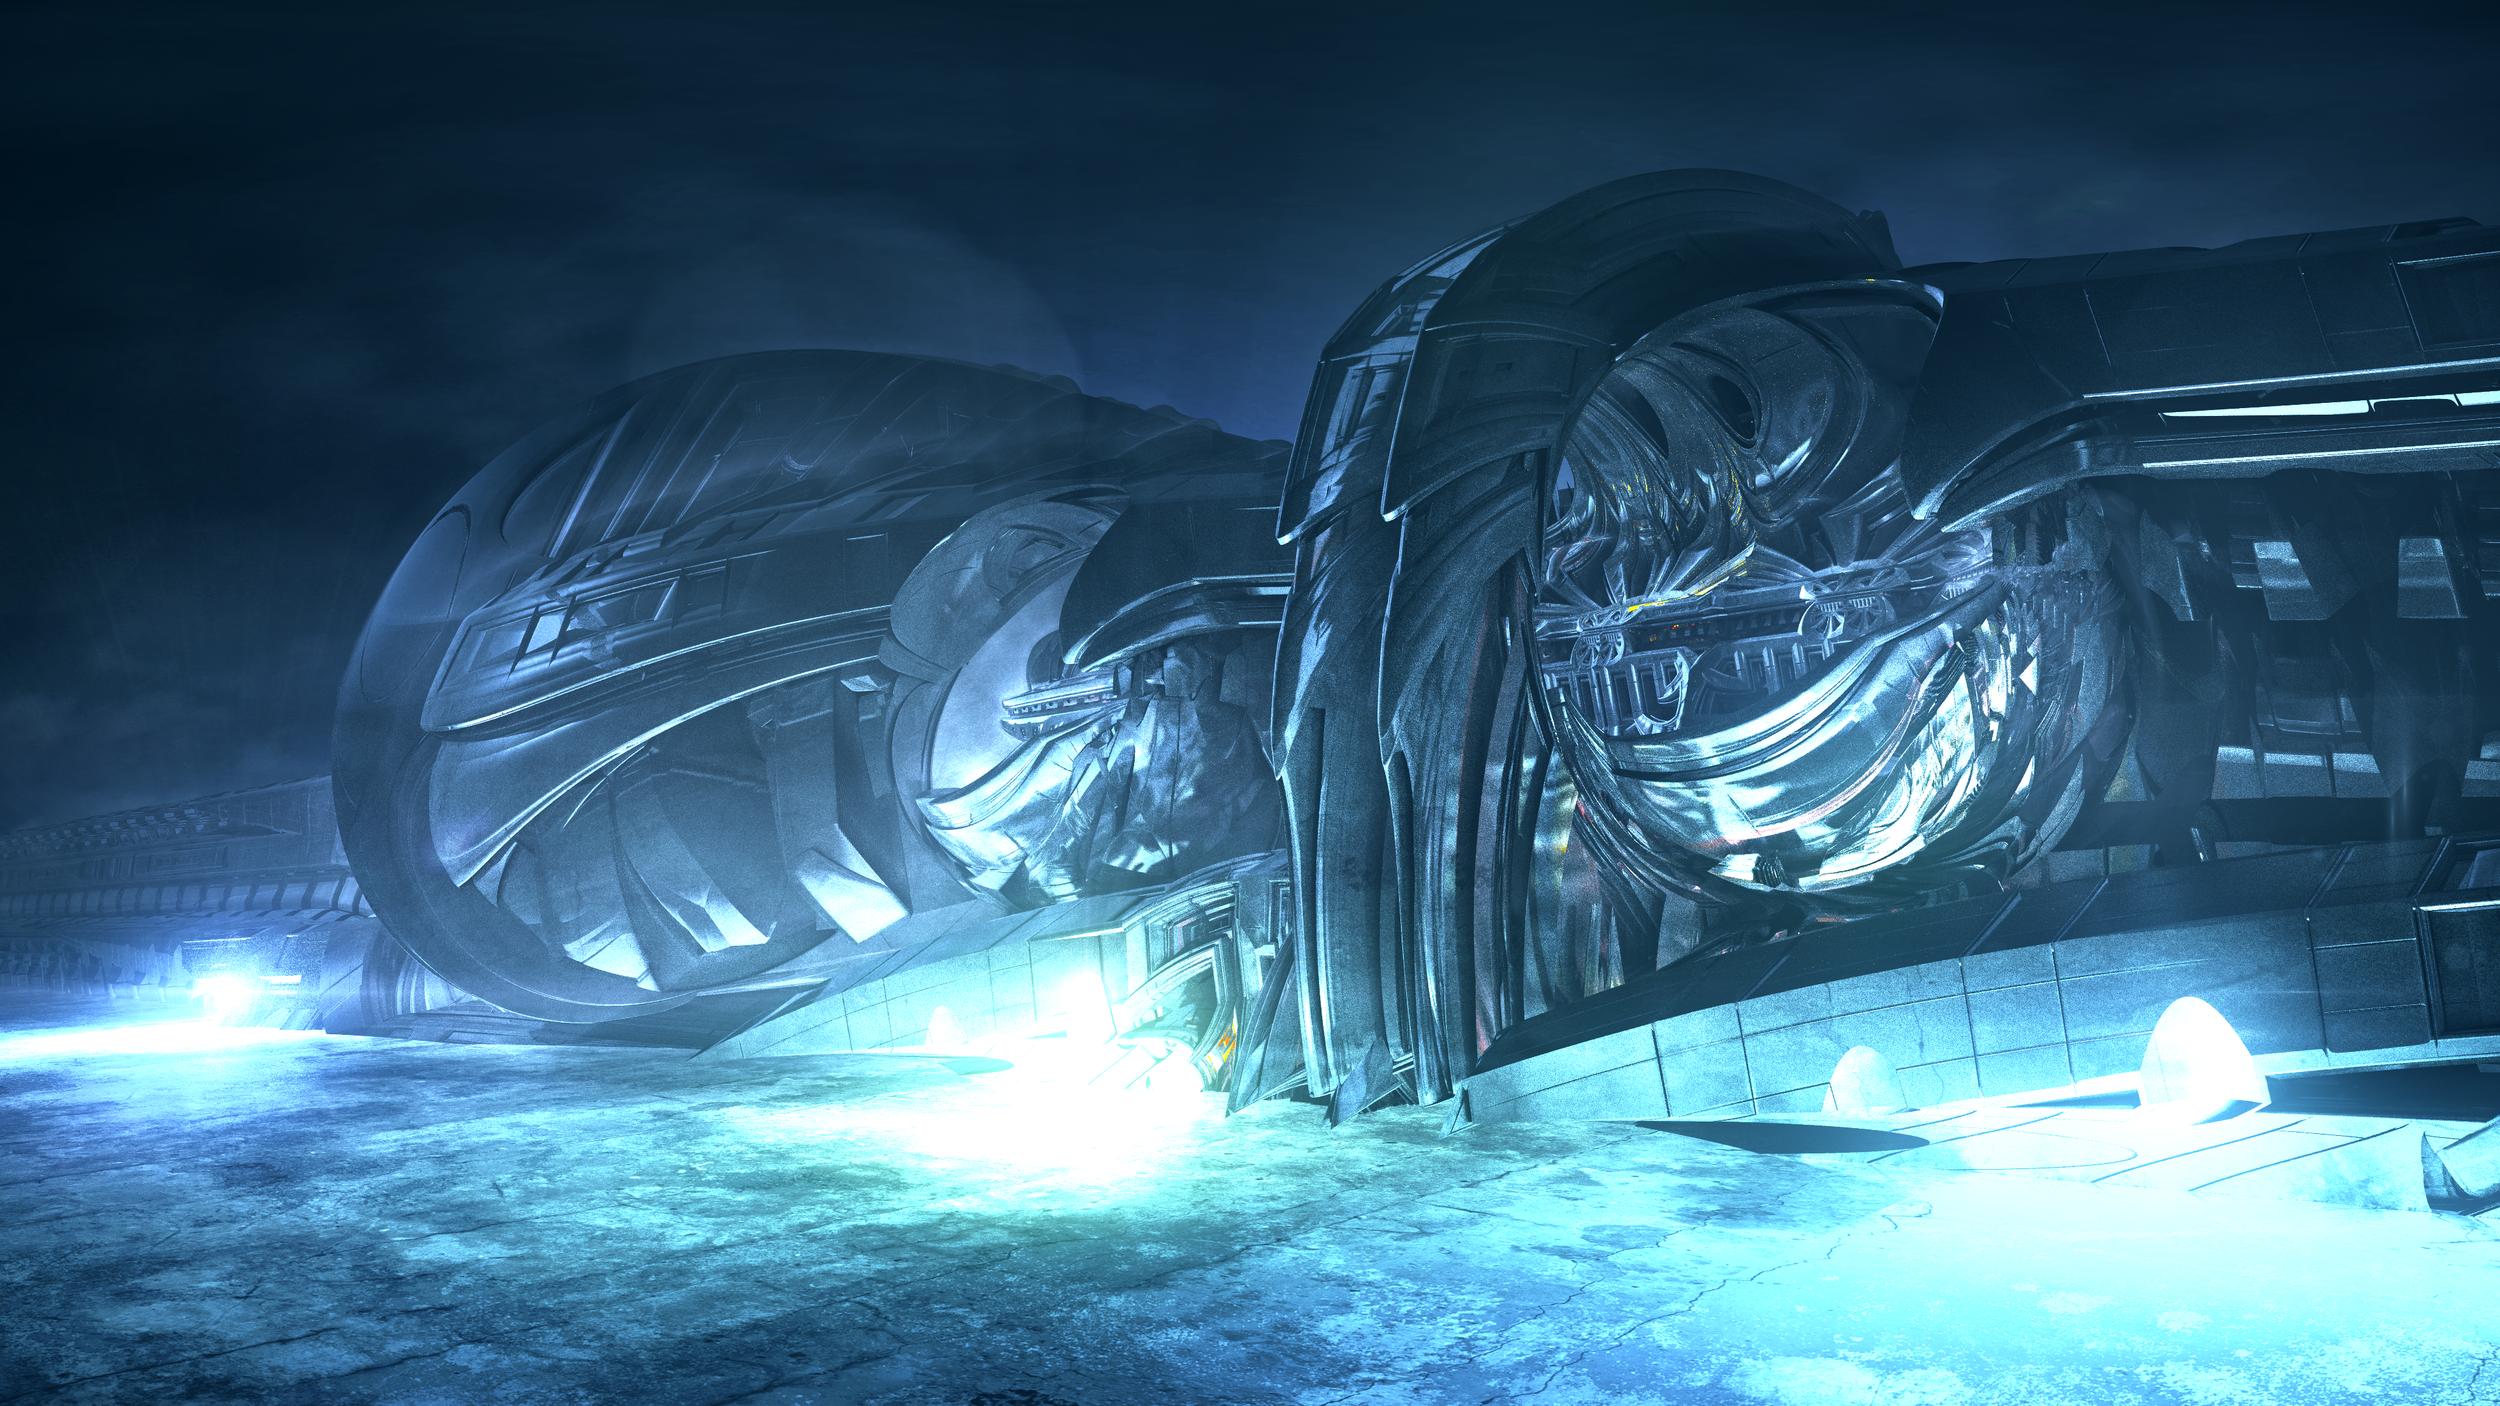 Frozen Station (3840x2160)